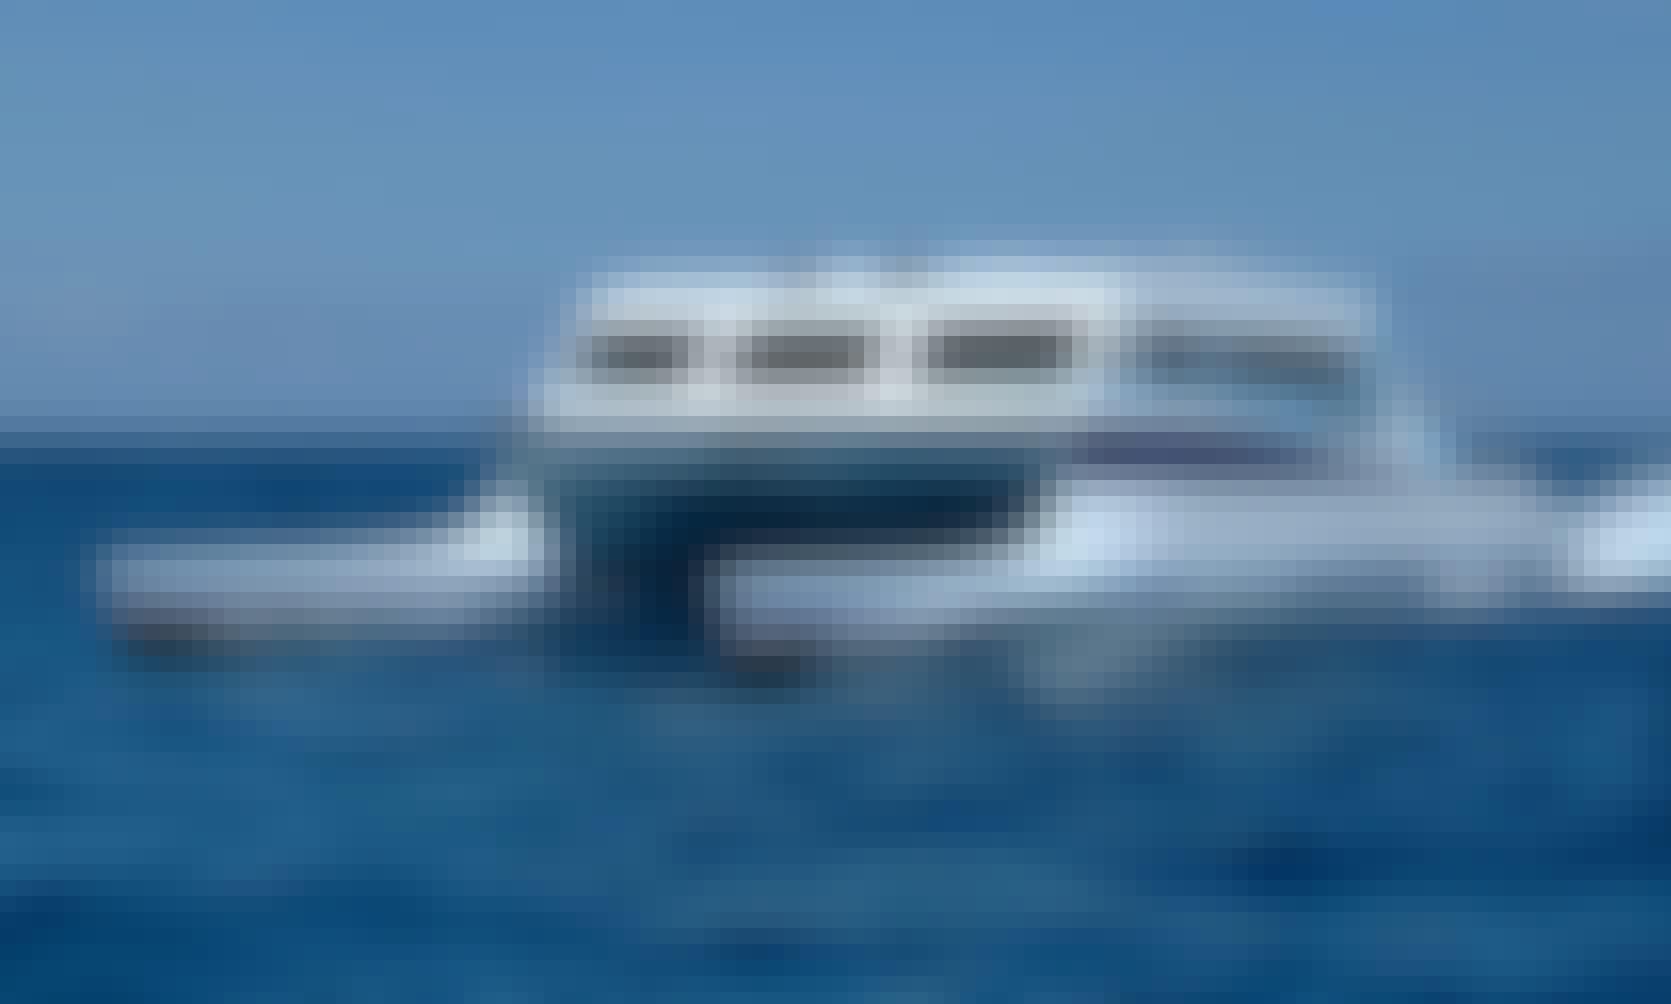 Ferry to St Barts Round Trip onboard 62' High Speed Wave Piercer in